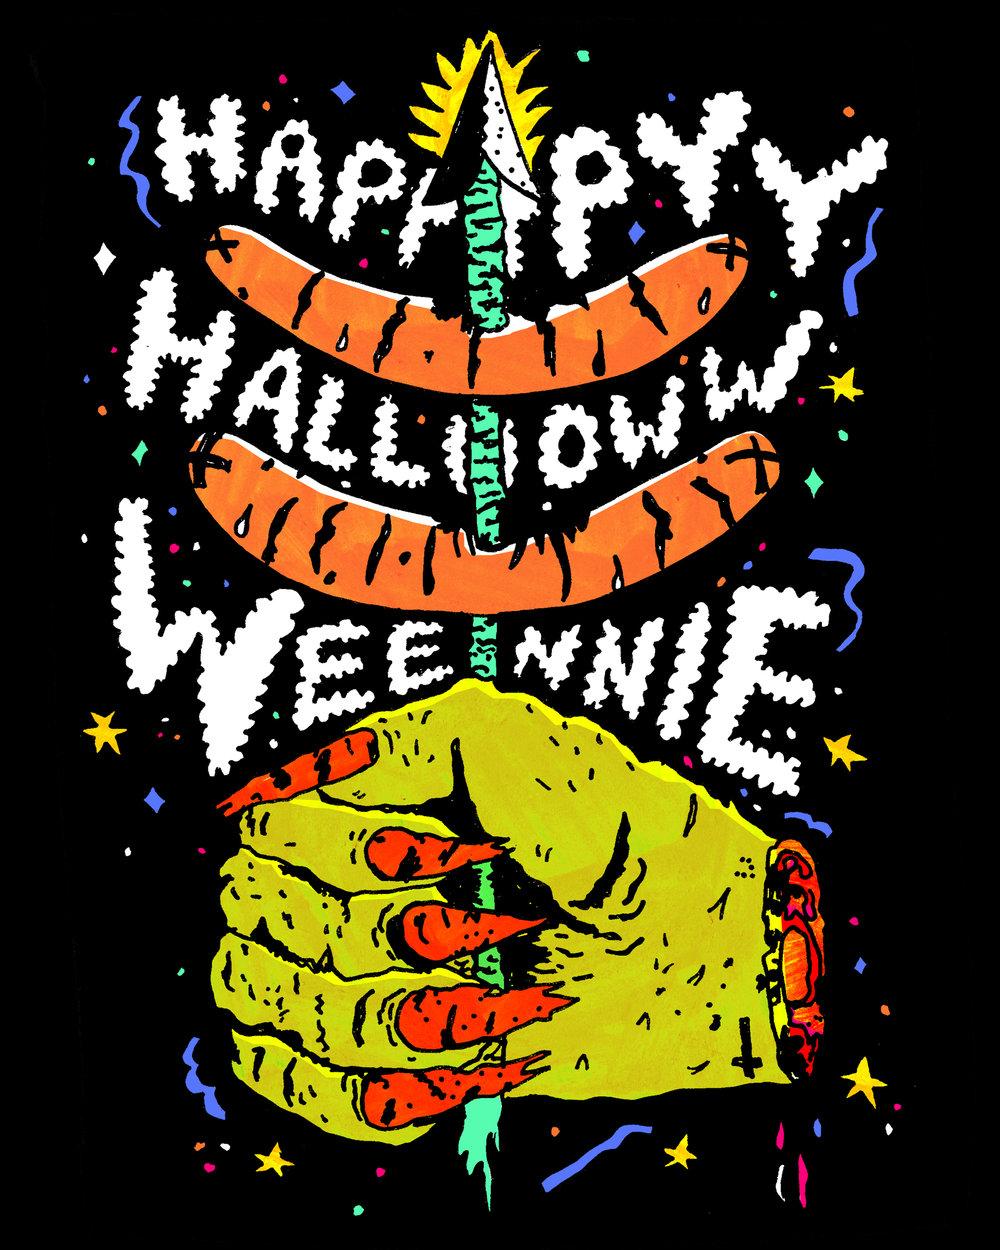 halloweenies.jpg